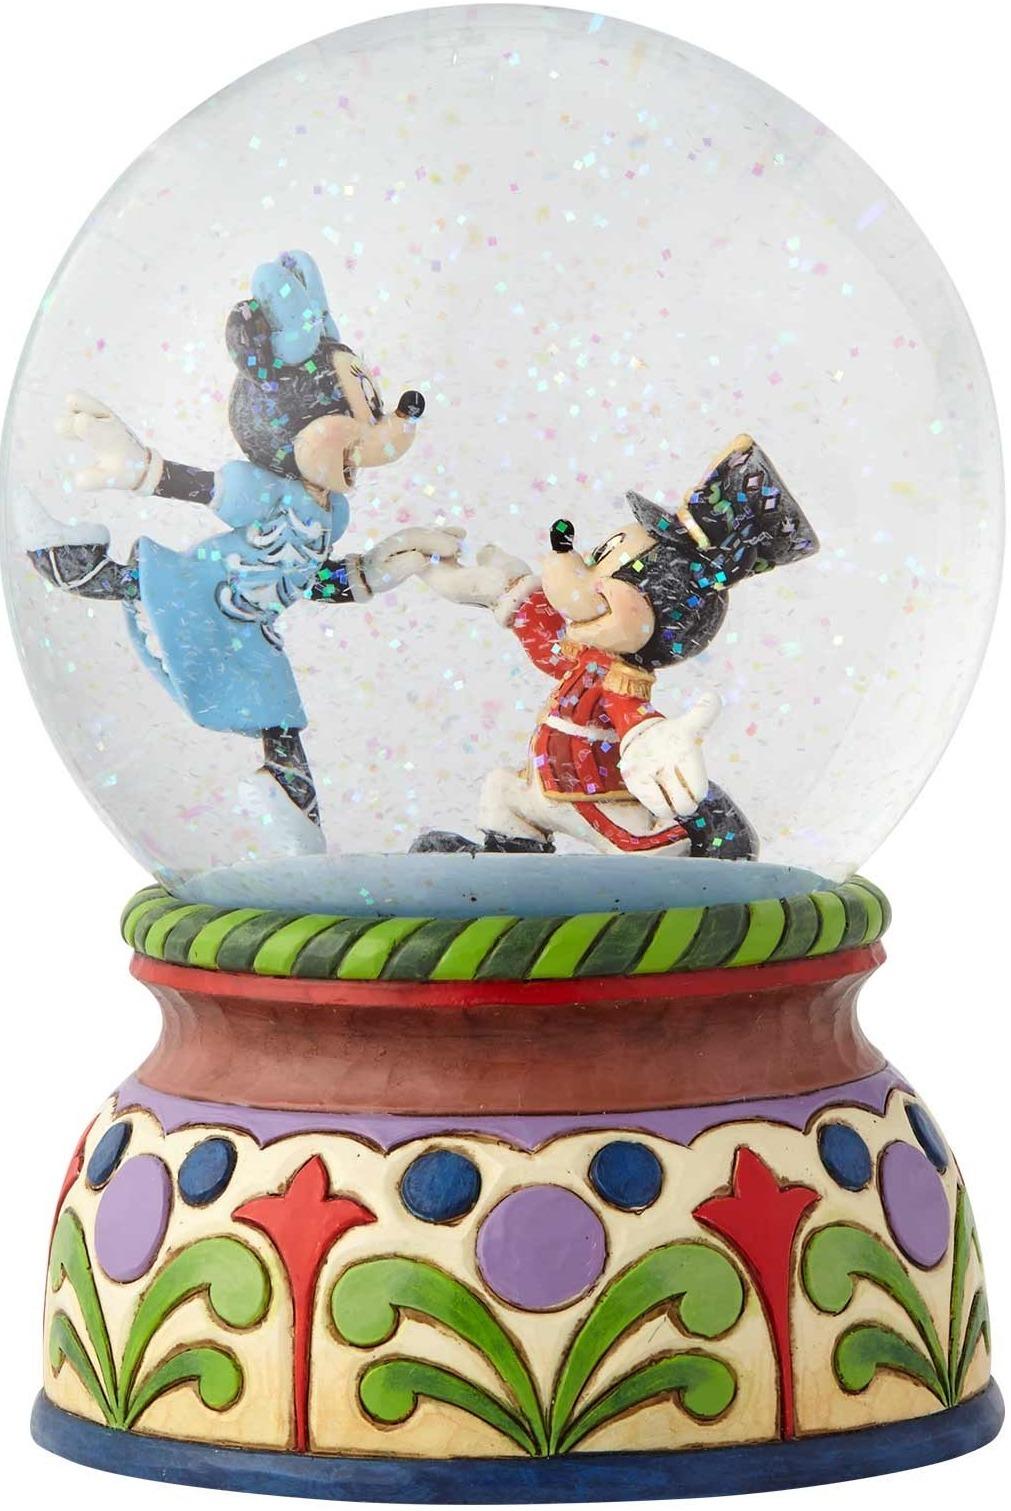 Disney Traditions by Jim Shore 6000944 Nutcracker waterball